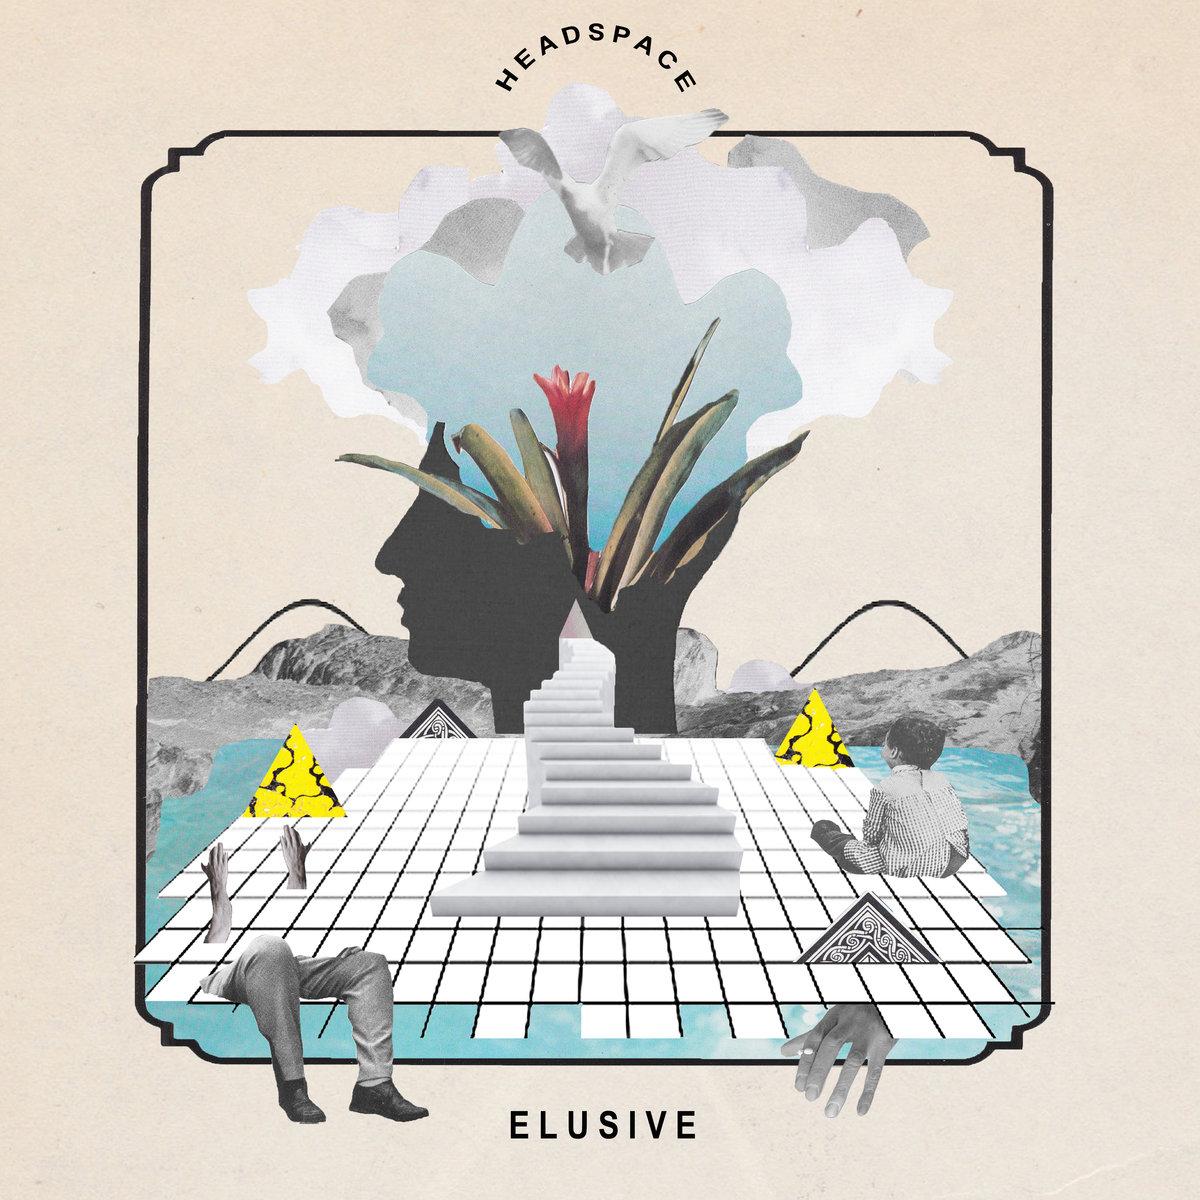 Elusive – Headspace